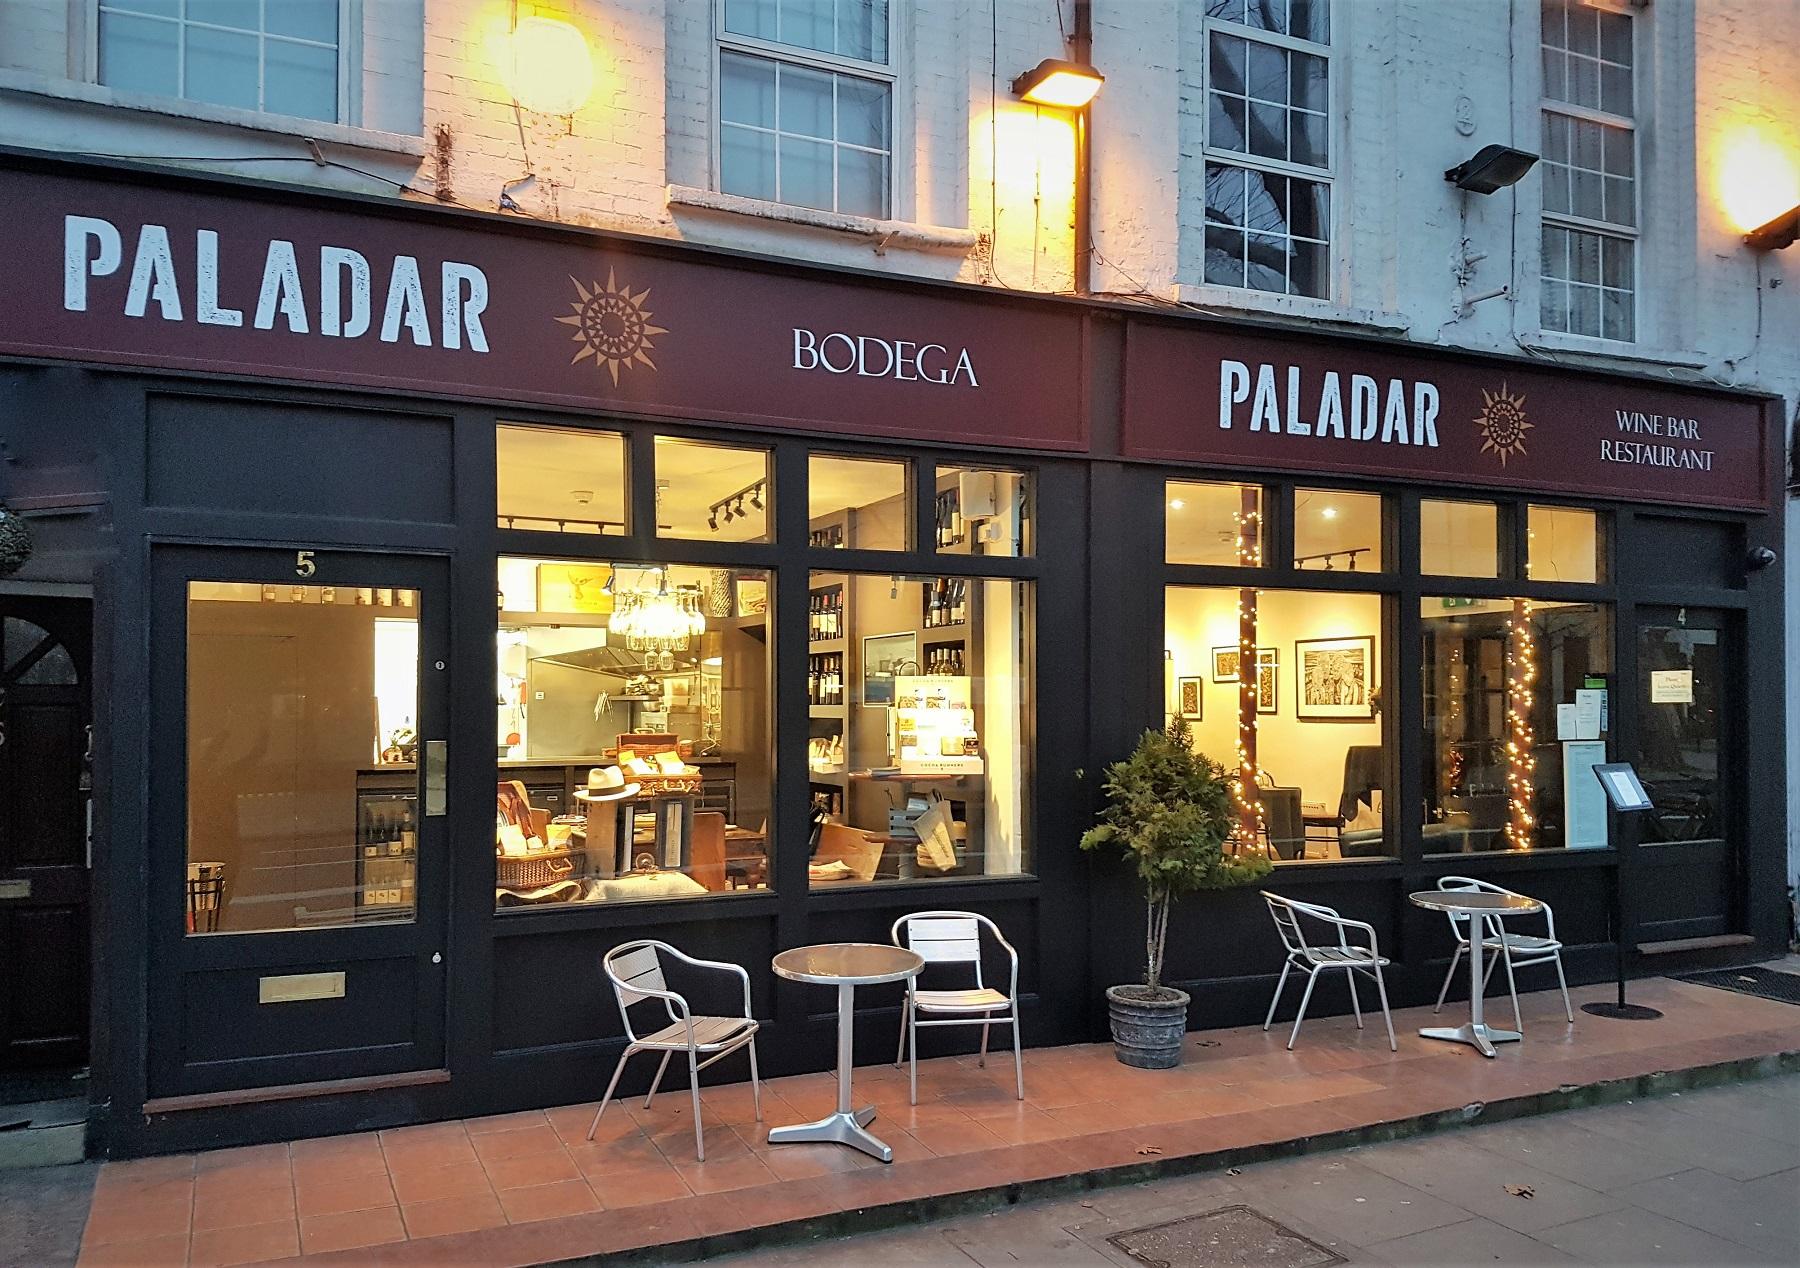 Paladar Latin American Restaurant in Elephant and Castle South East London Club Card 8.jpg